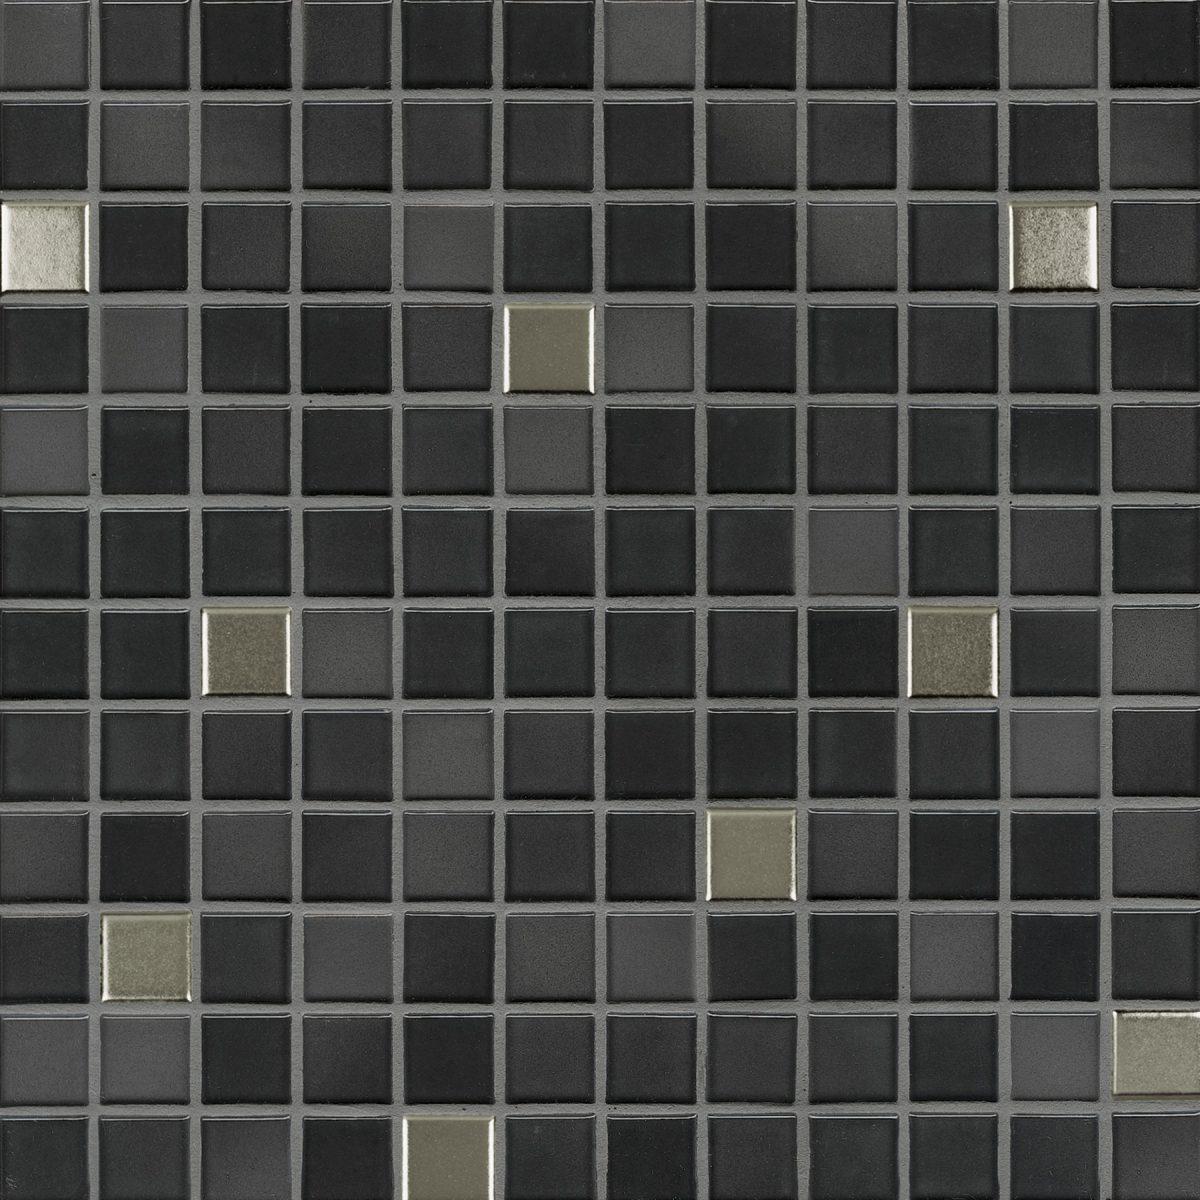 Мозаика серия Fresh 2,4 X 2,4 см Midnight Black Mix Metal Glossy (глазурованная)